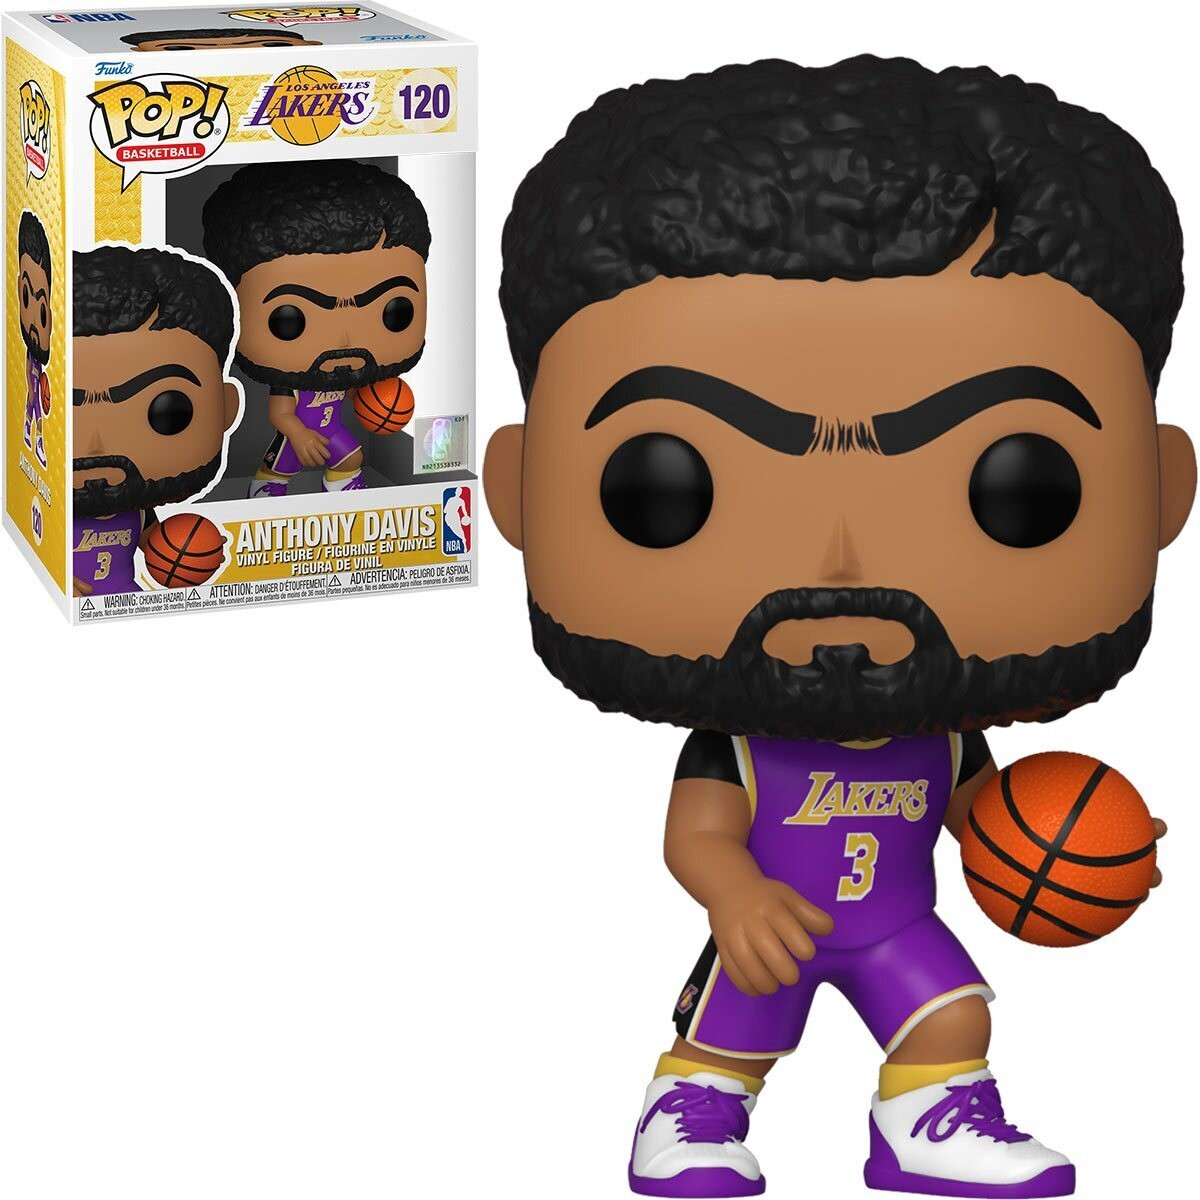 PRE-ORDER Funko NBA Lakers Anthony Davis (Purple Jersey) Pop! Vinyl Figure